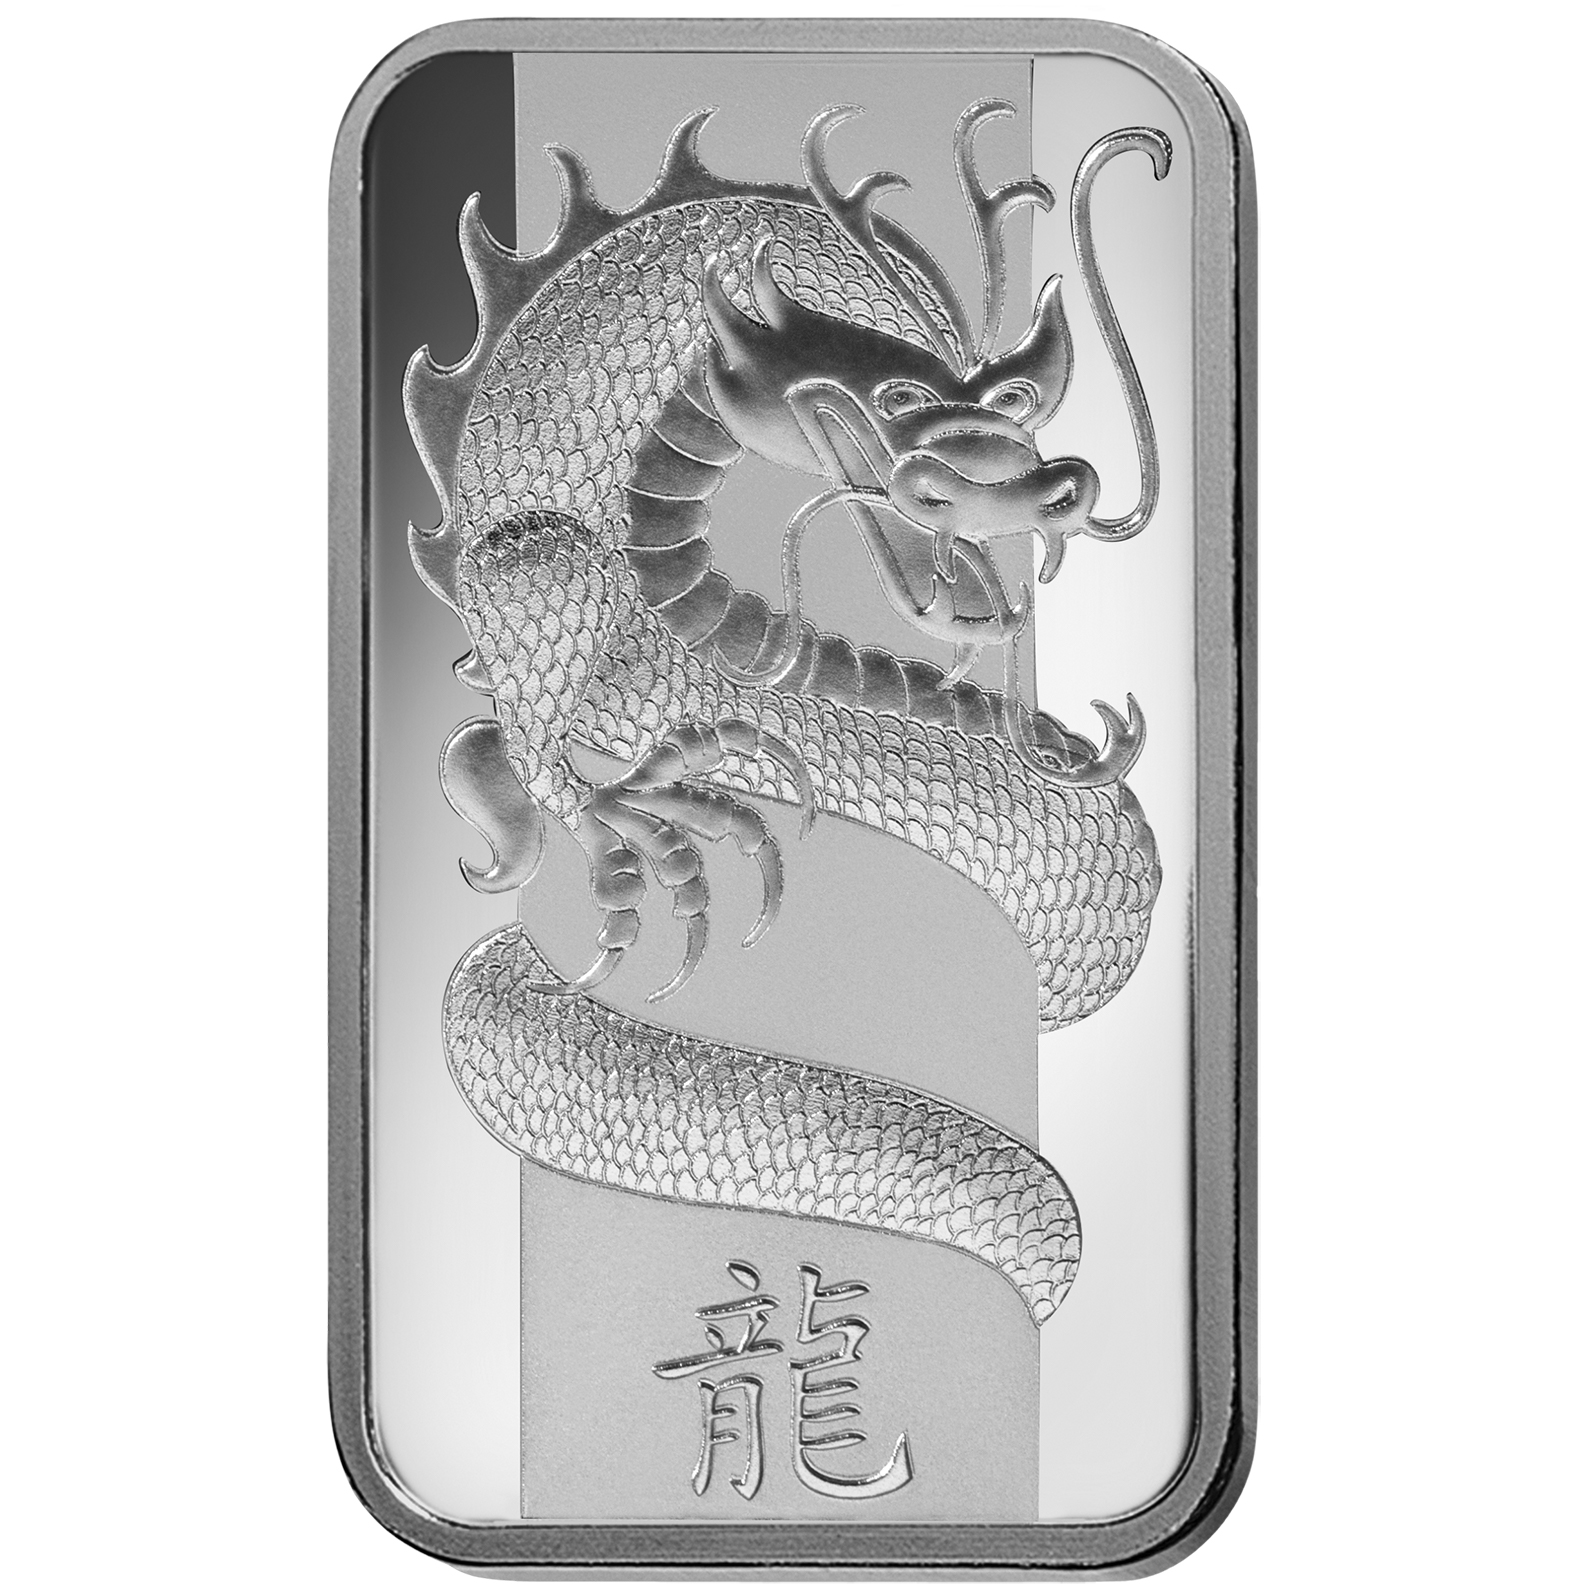 100 gram Fine Silver Bar 999.0 - PAMP Suisse Lunar Dragon